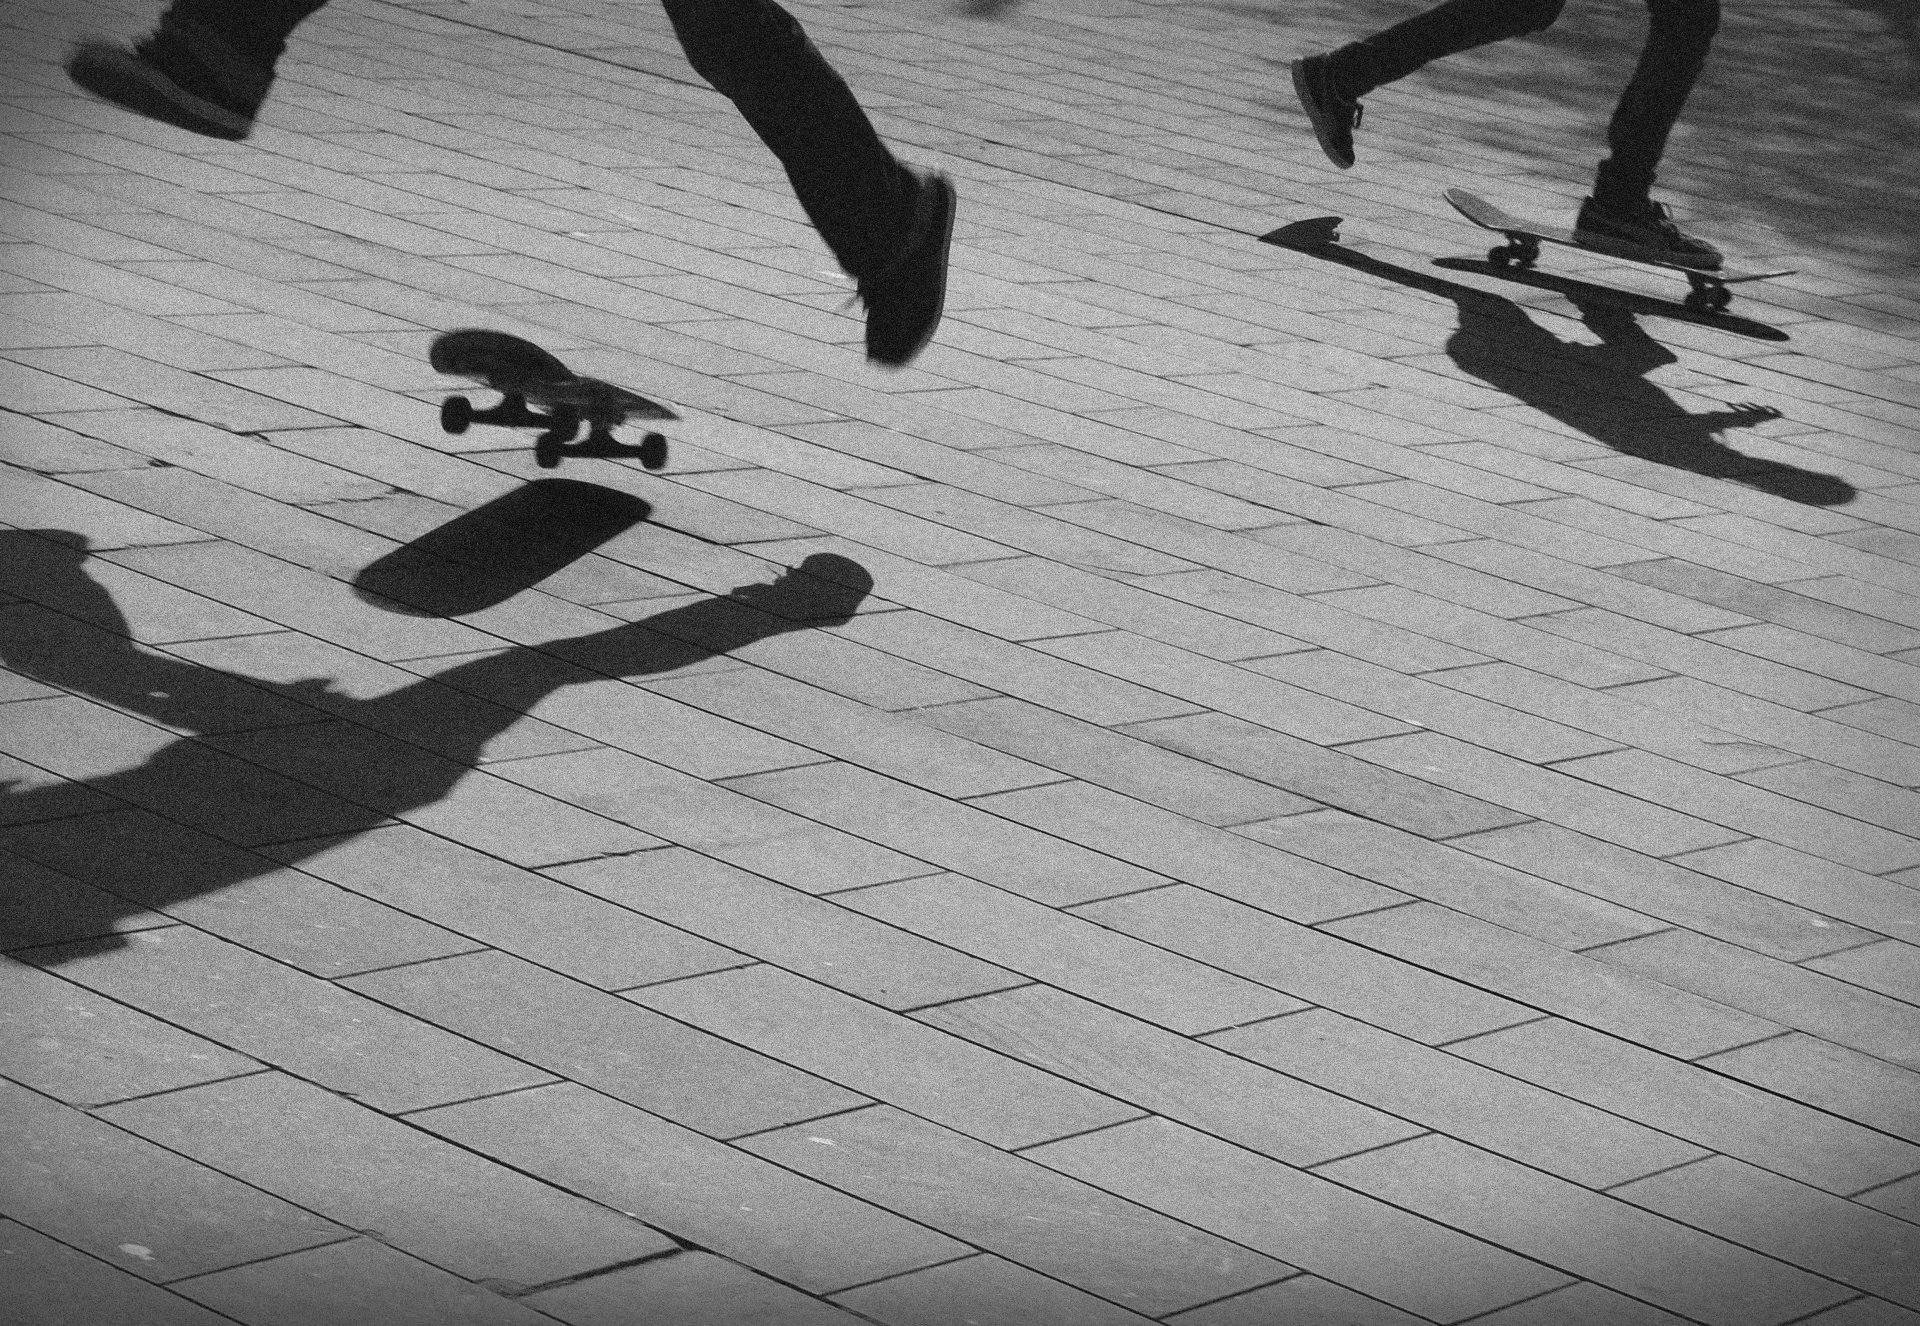 Iphone 6 Car Wallpaper Hd Skateboarding 4k Ultra Hd Wallpaper And Background Image